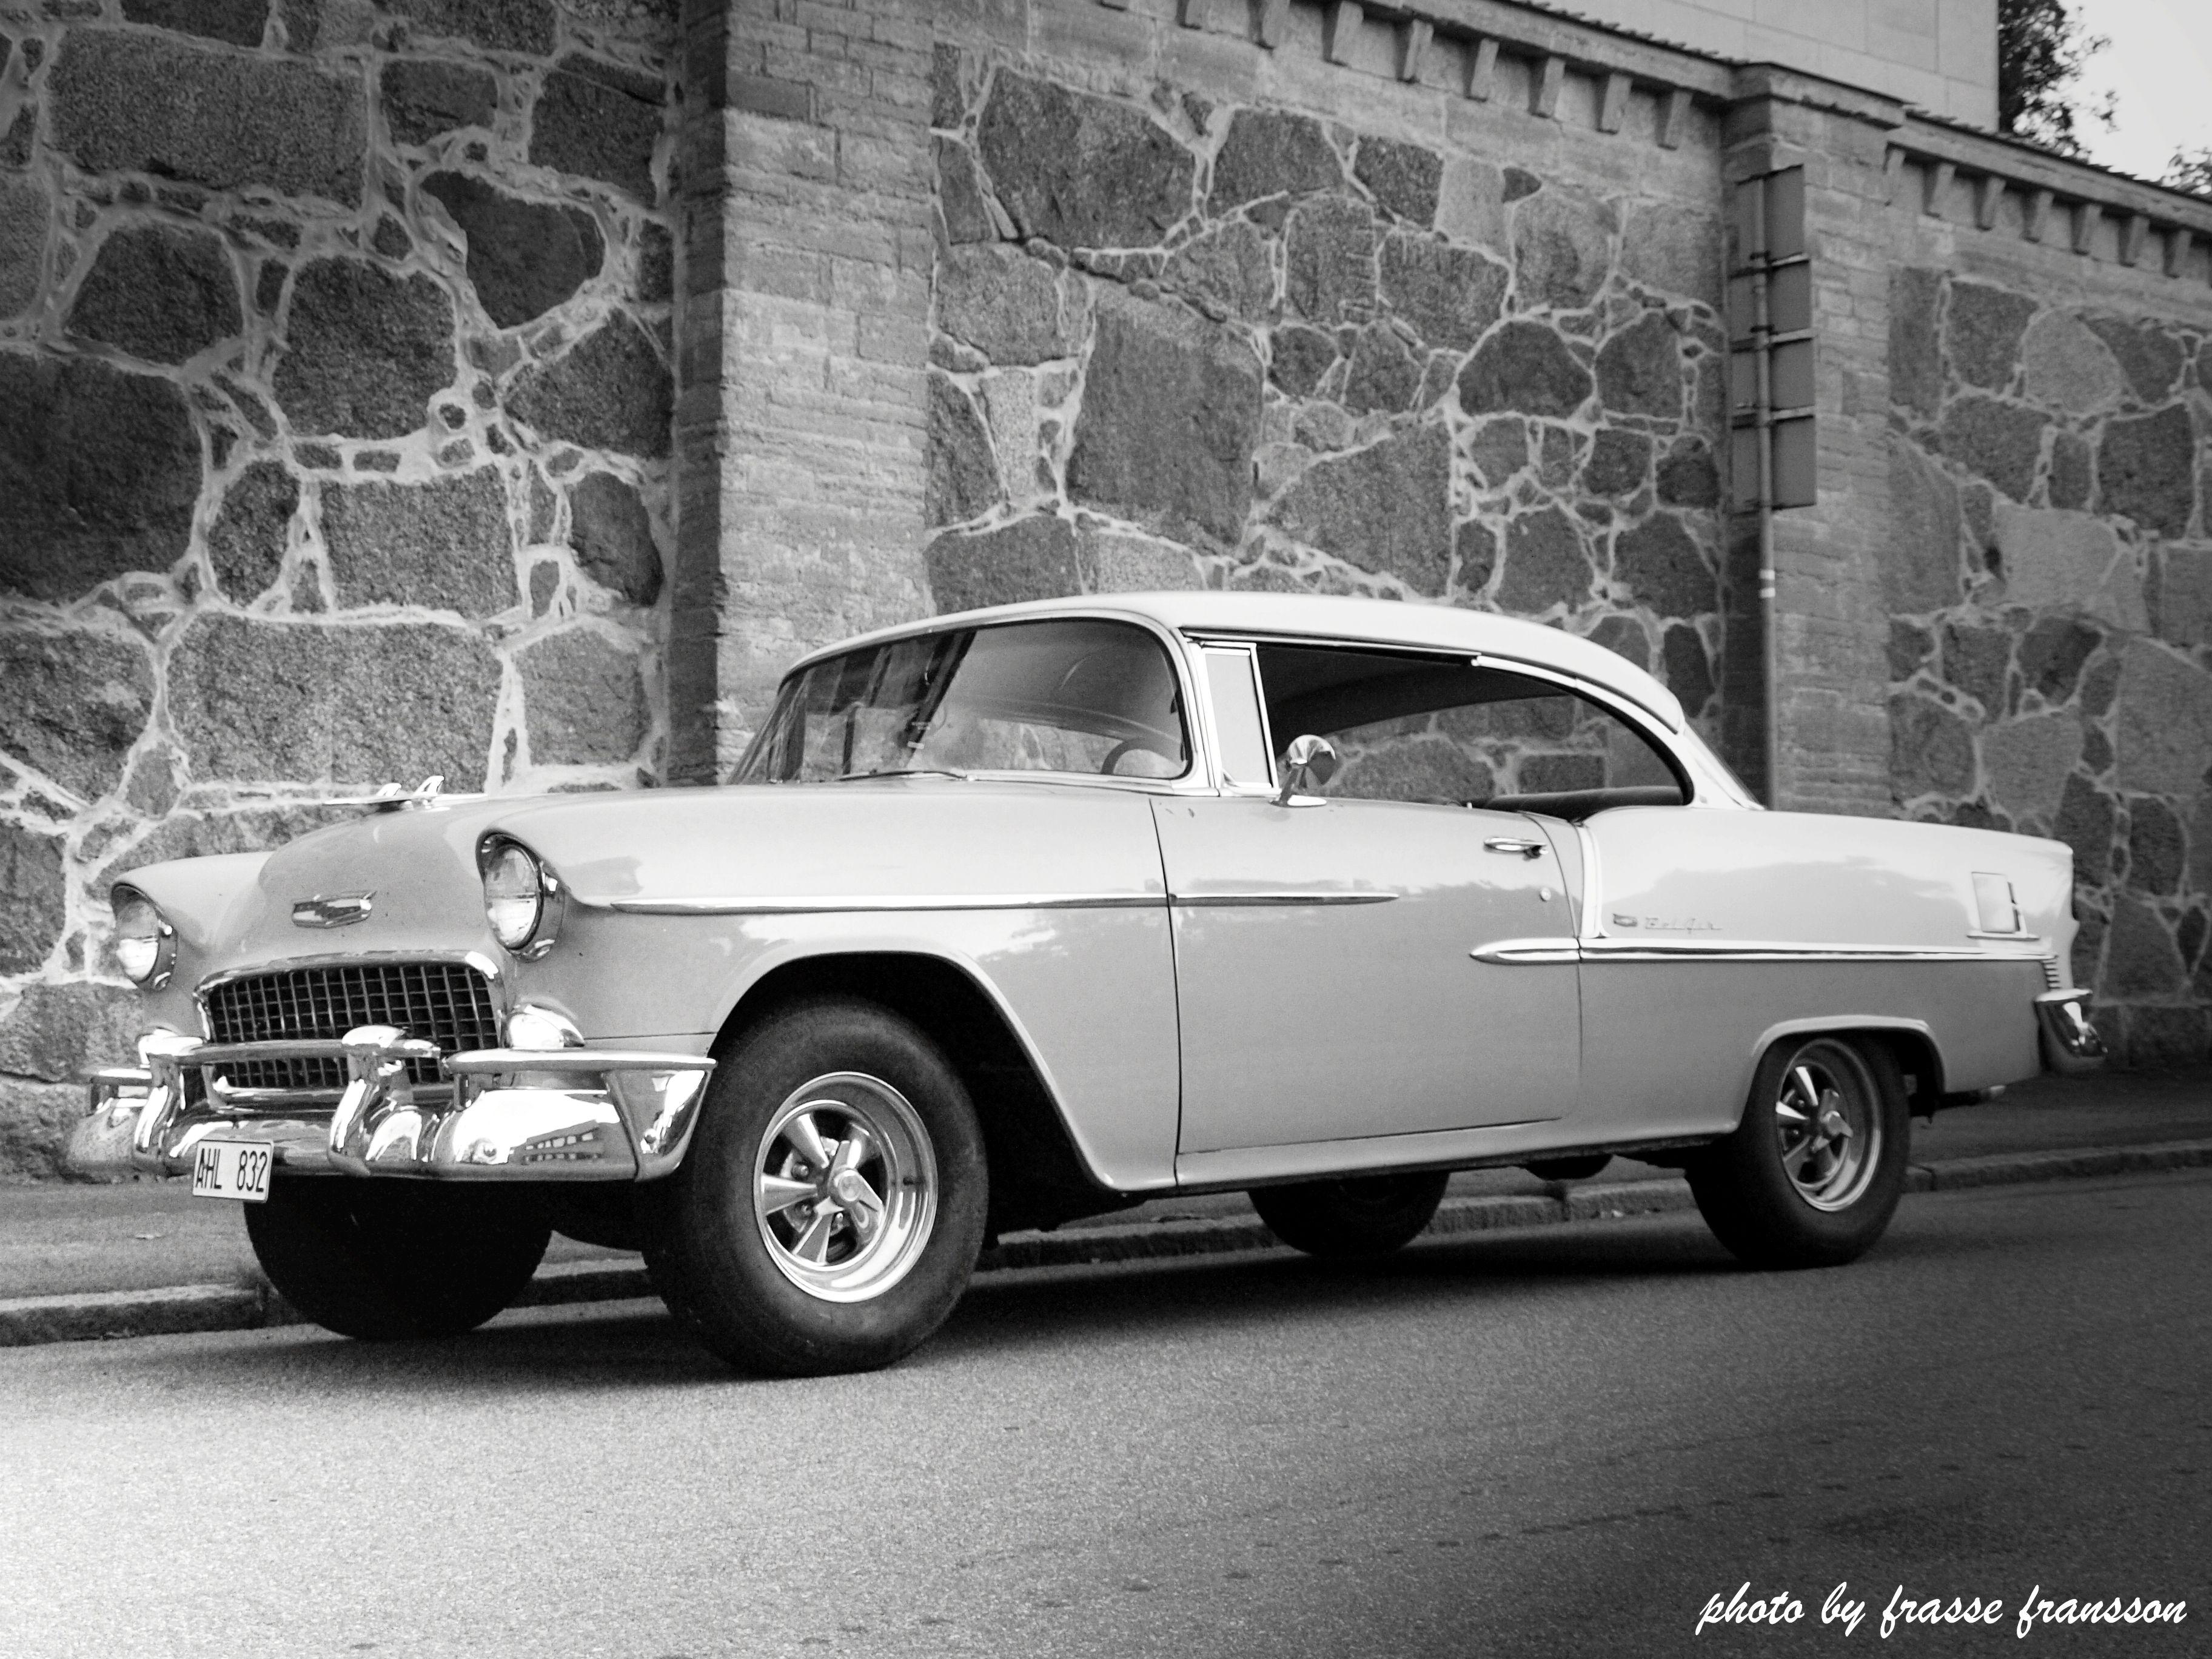 Chevrolet Bel Air 2d Ht 1955 Dreams on wheels